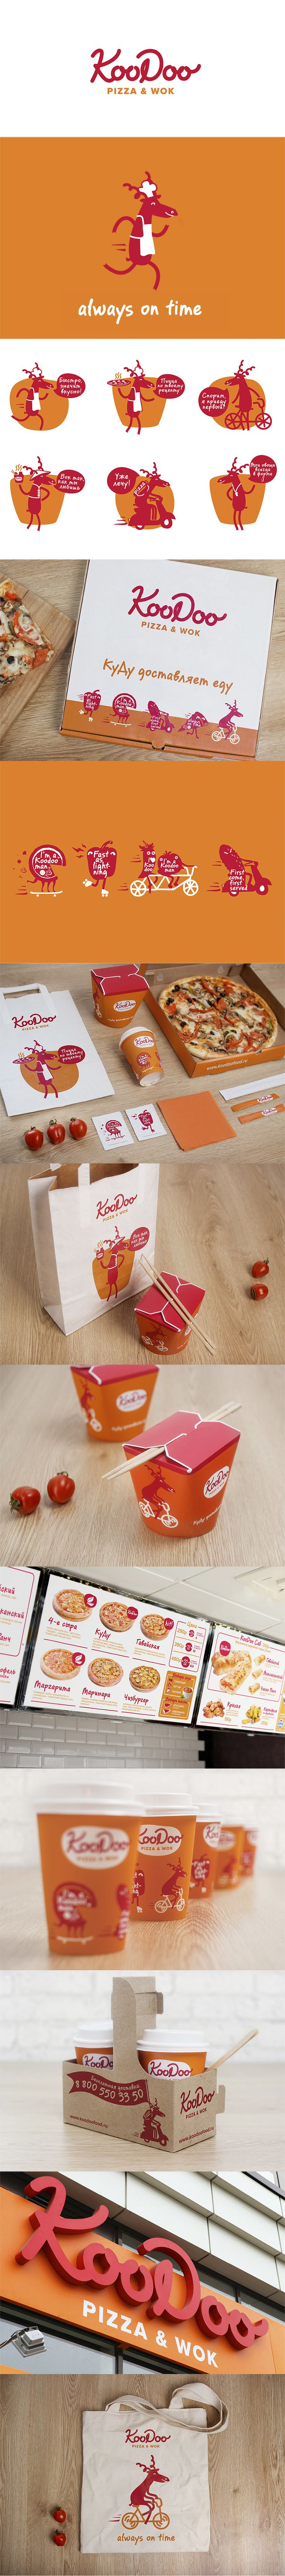 KooDoo Pizza  Wok what a combination! Фирменный стиль © ЛюдаГальченко. Let's eat identity packaging Branding PD